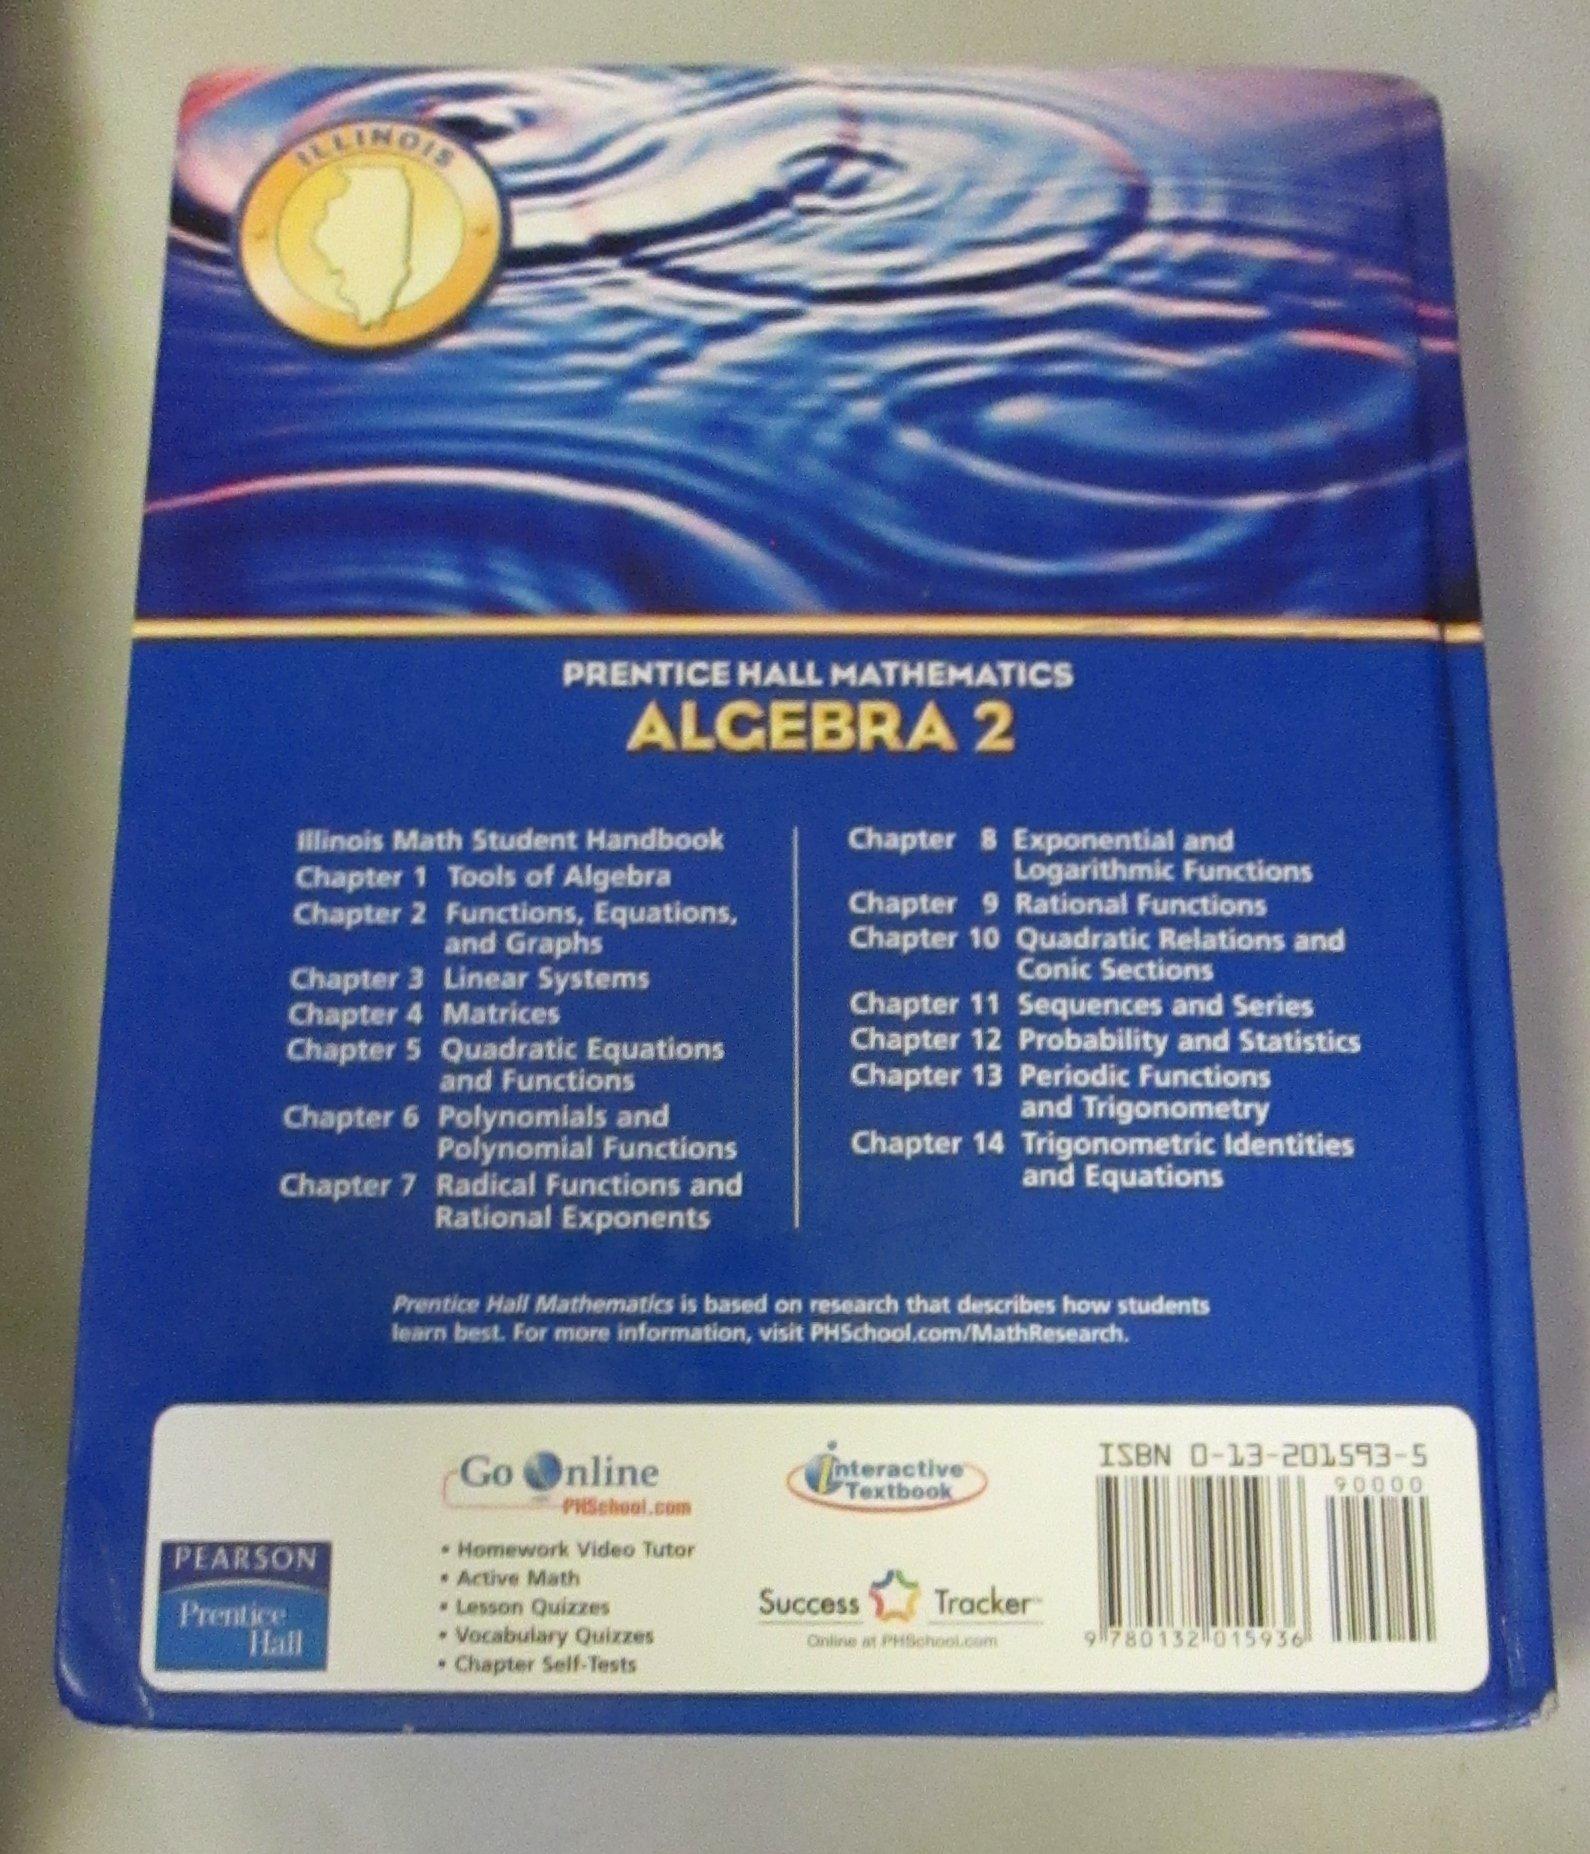 Algebra 2 (Prentice Hall Mathematics) Illinois Edition